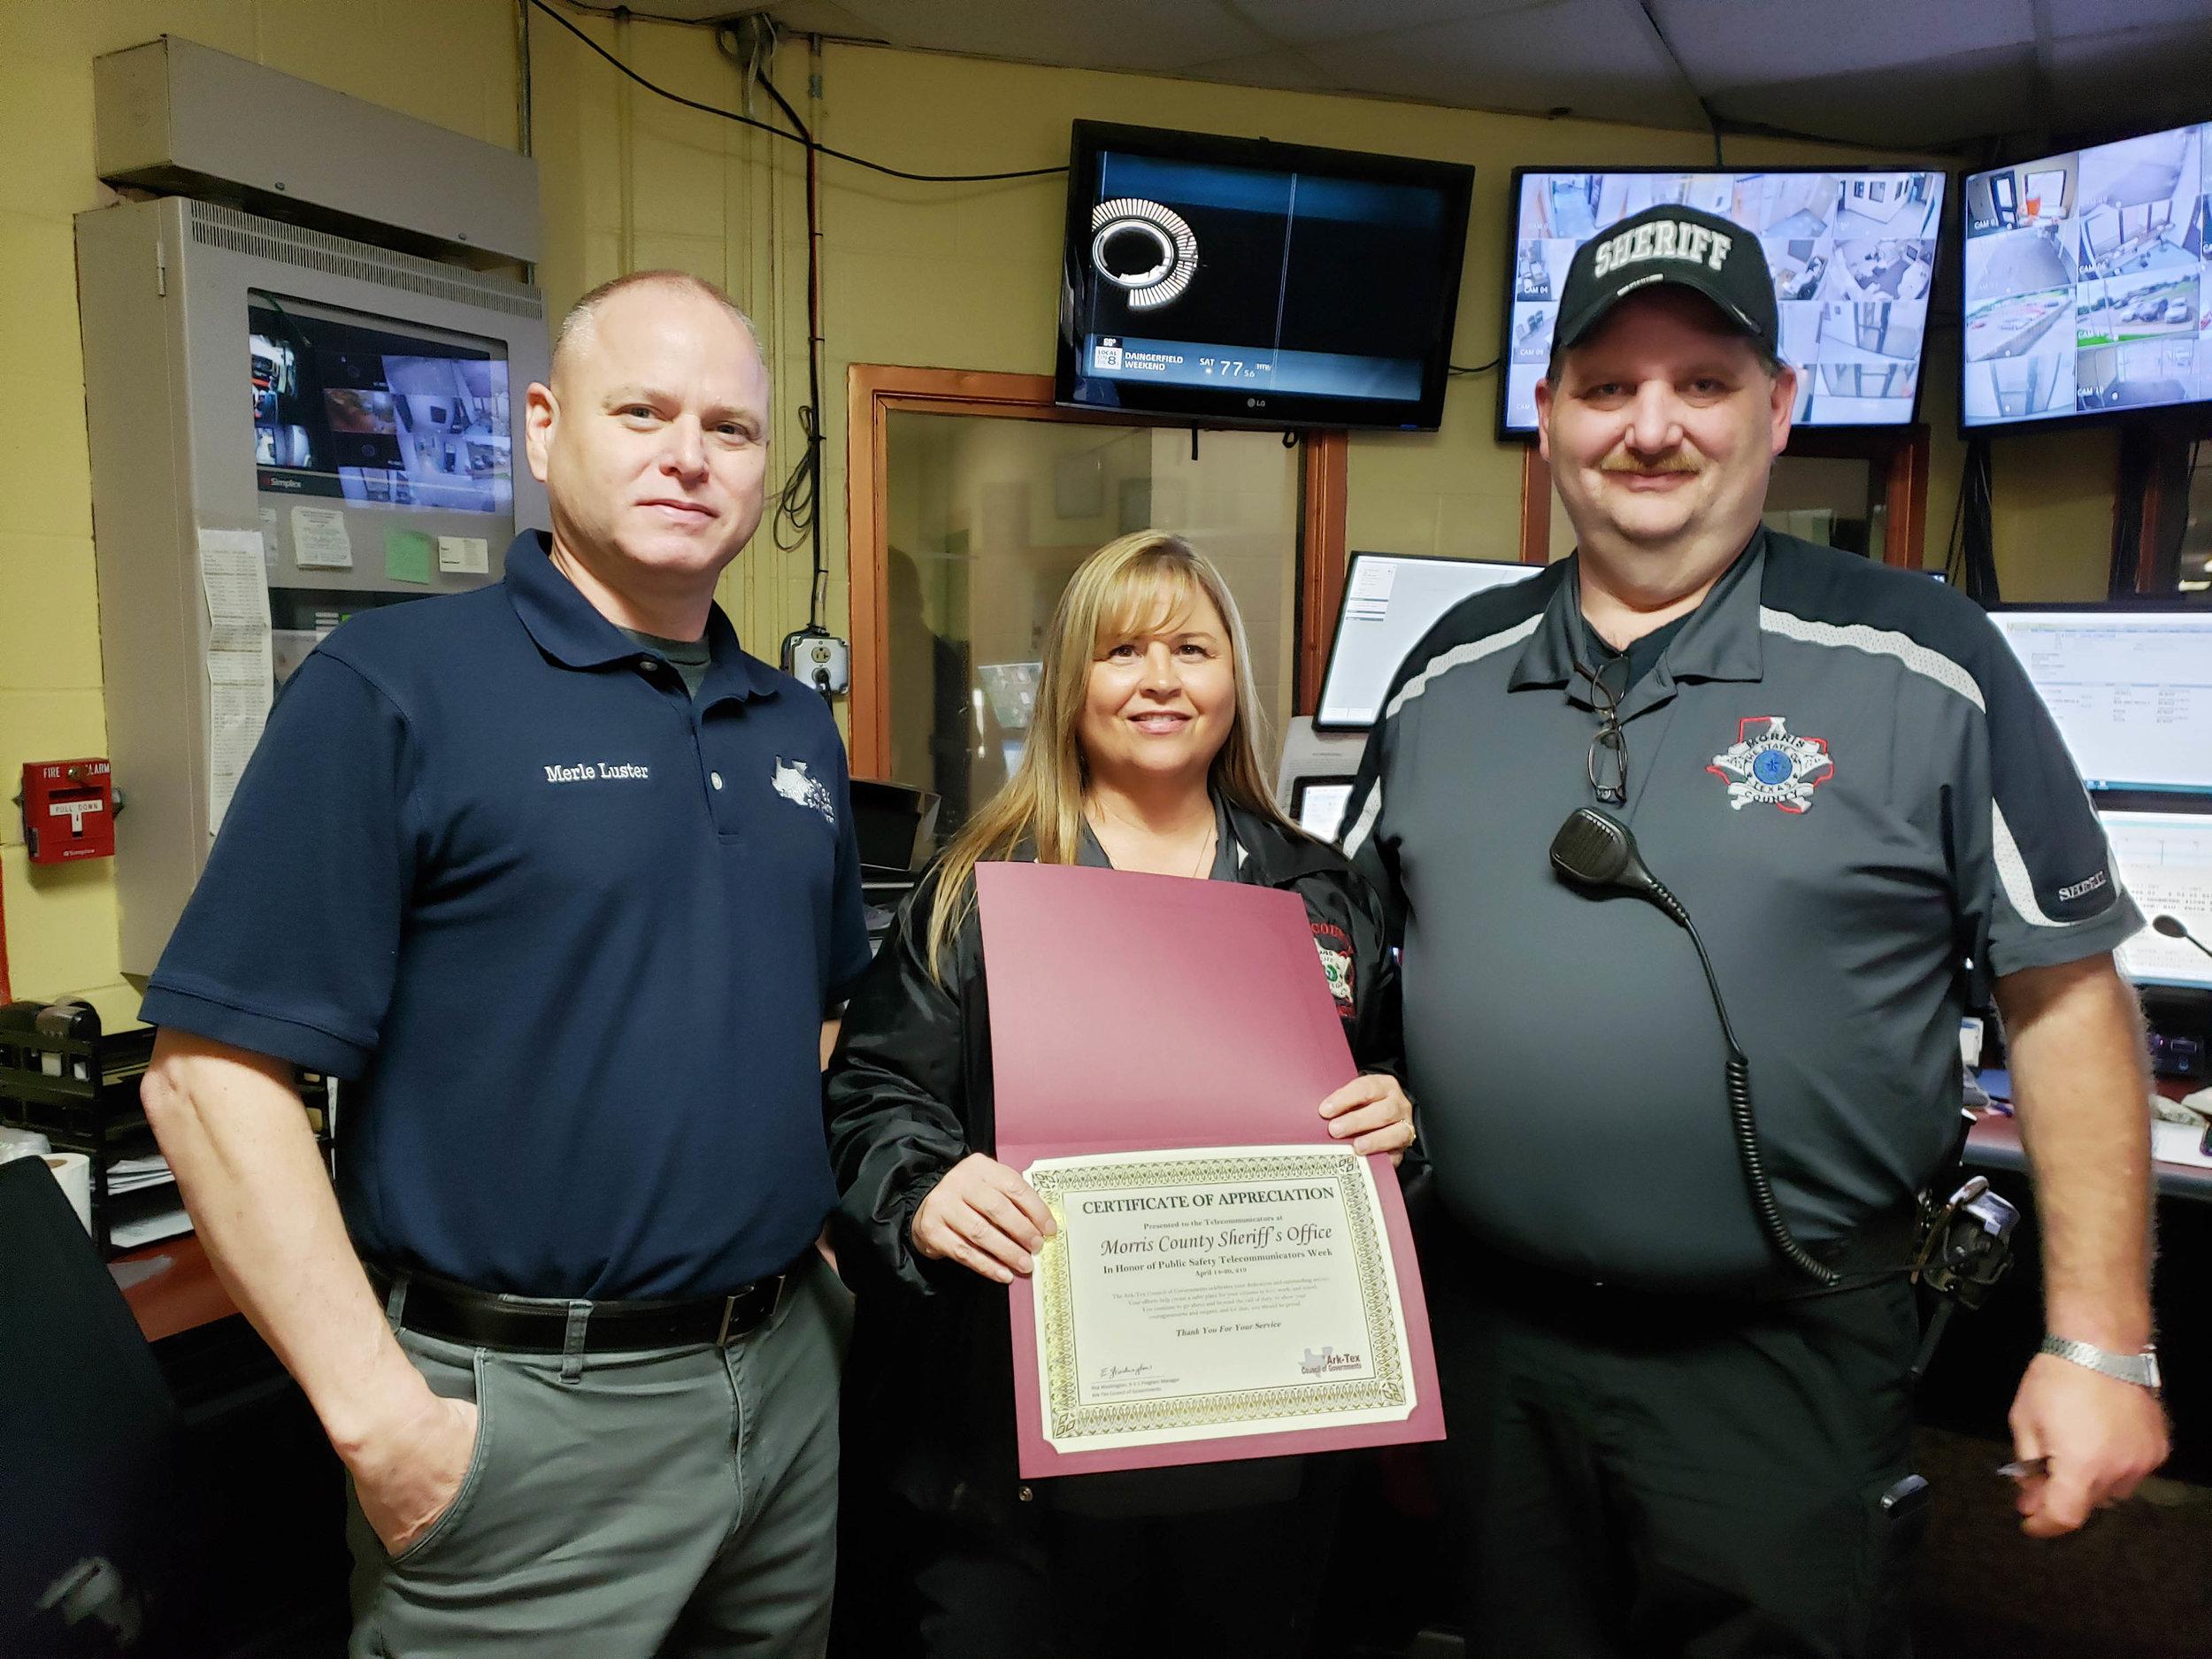 Merle Luster, Cheryl Murphy and Ken Thomas